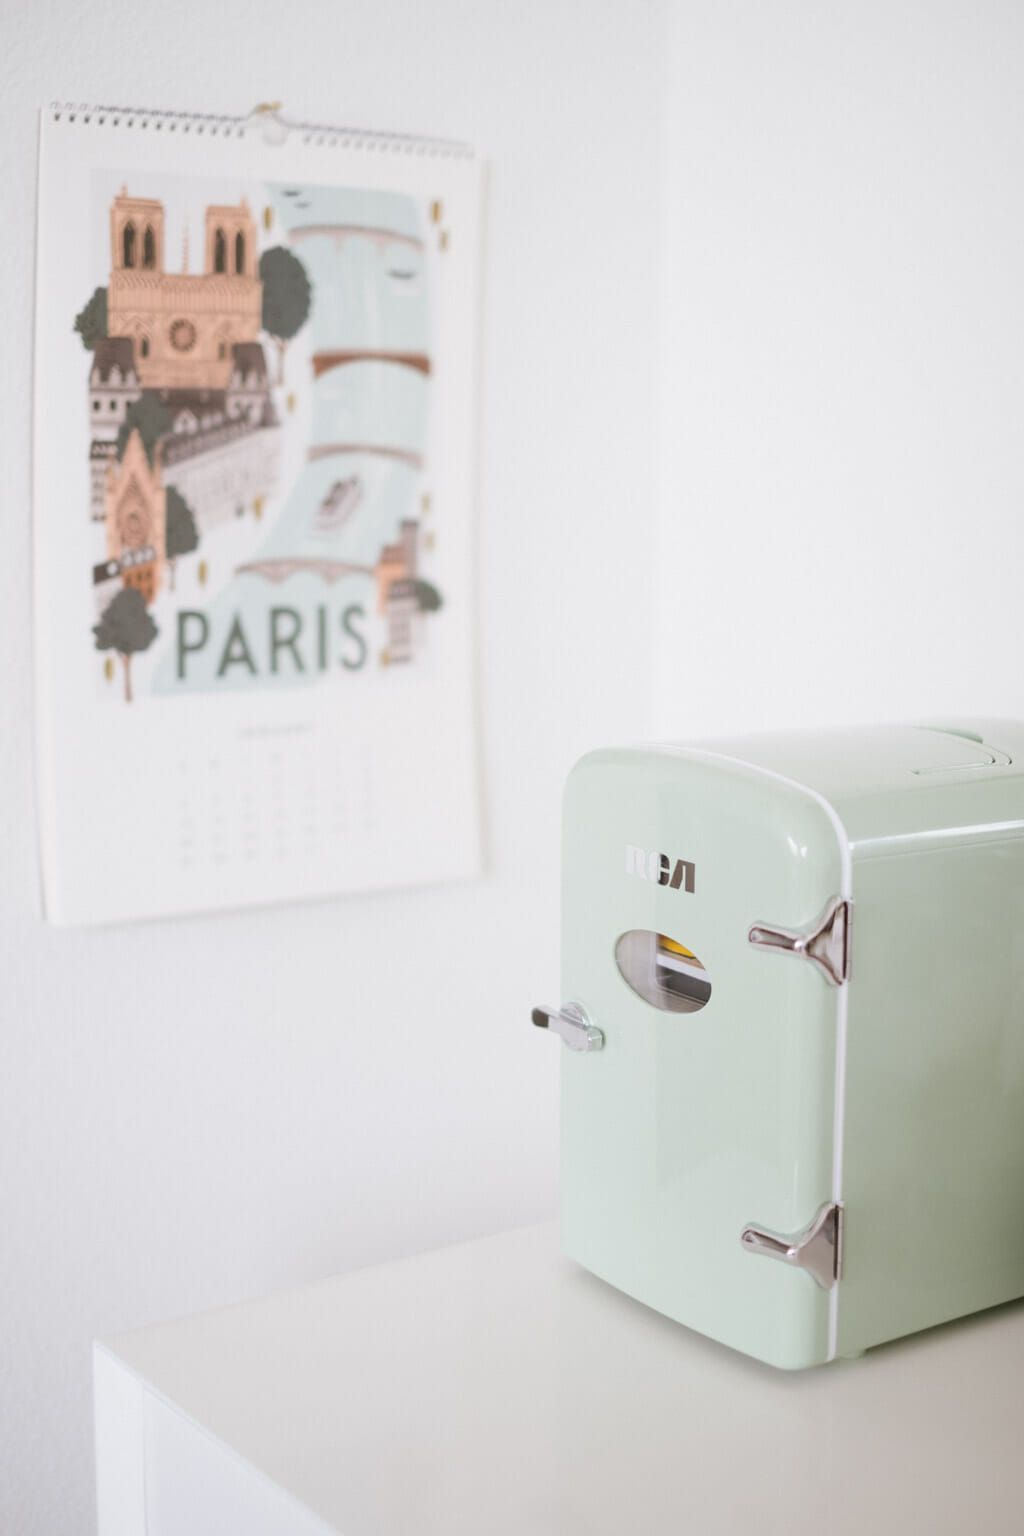 Retro Beauty Fridge - Mint Green Mini Refrigerator